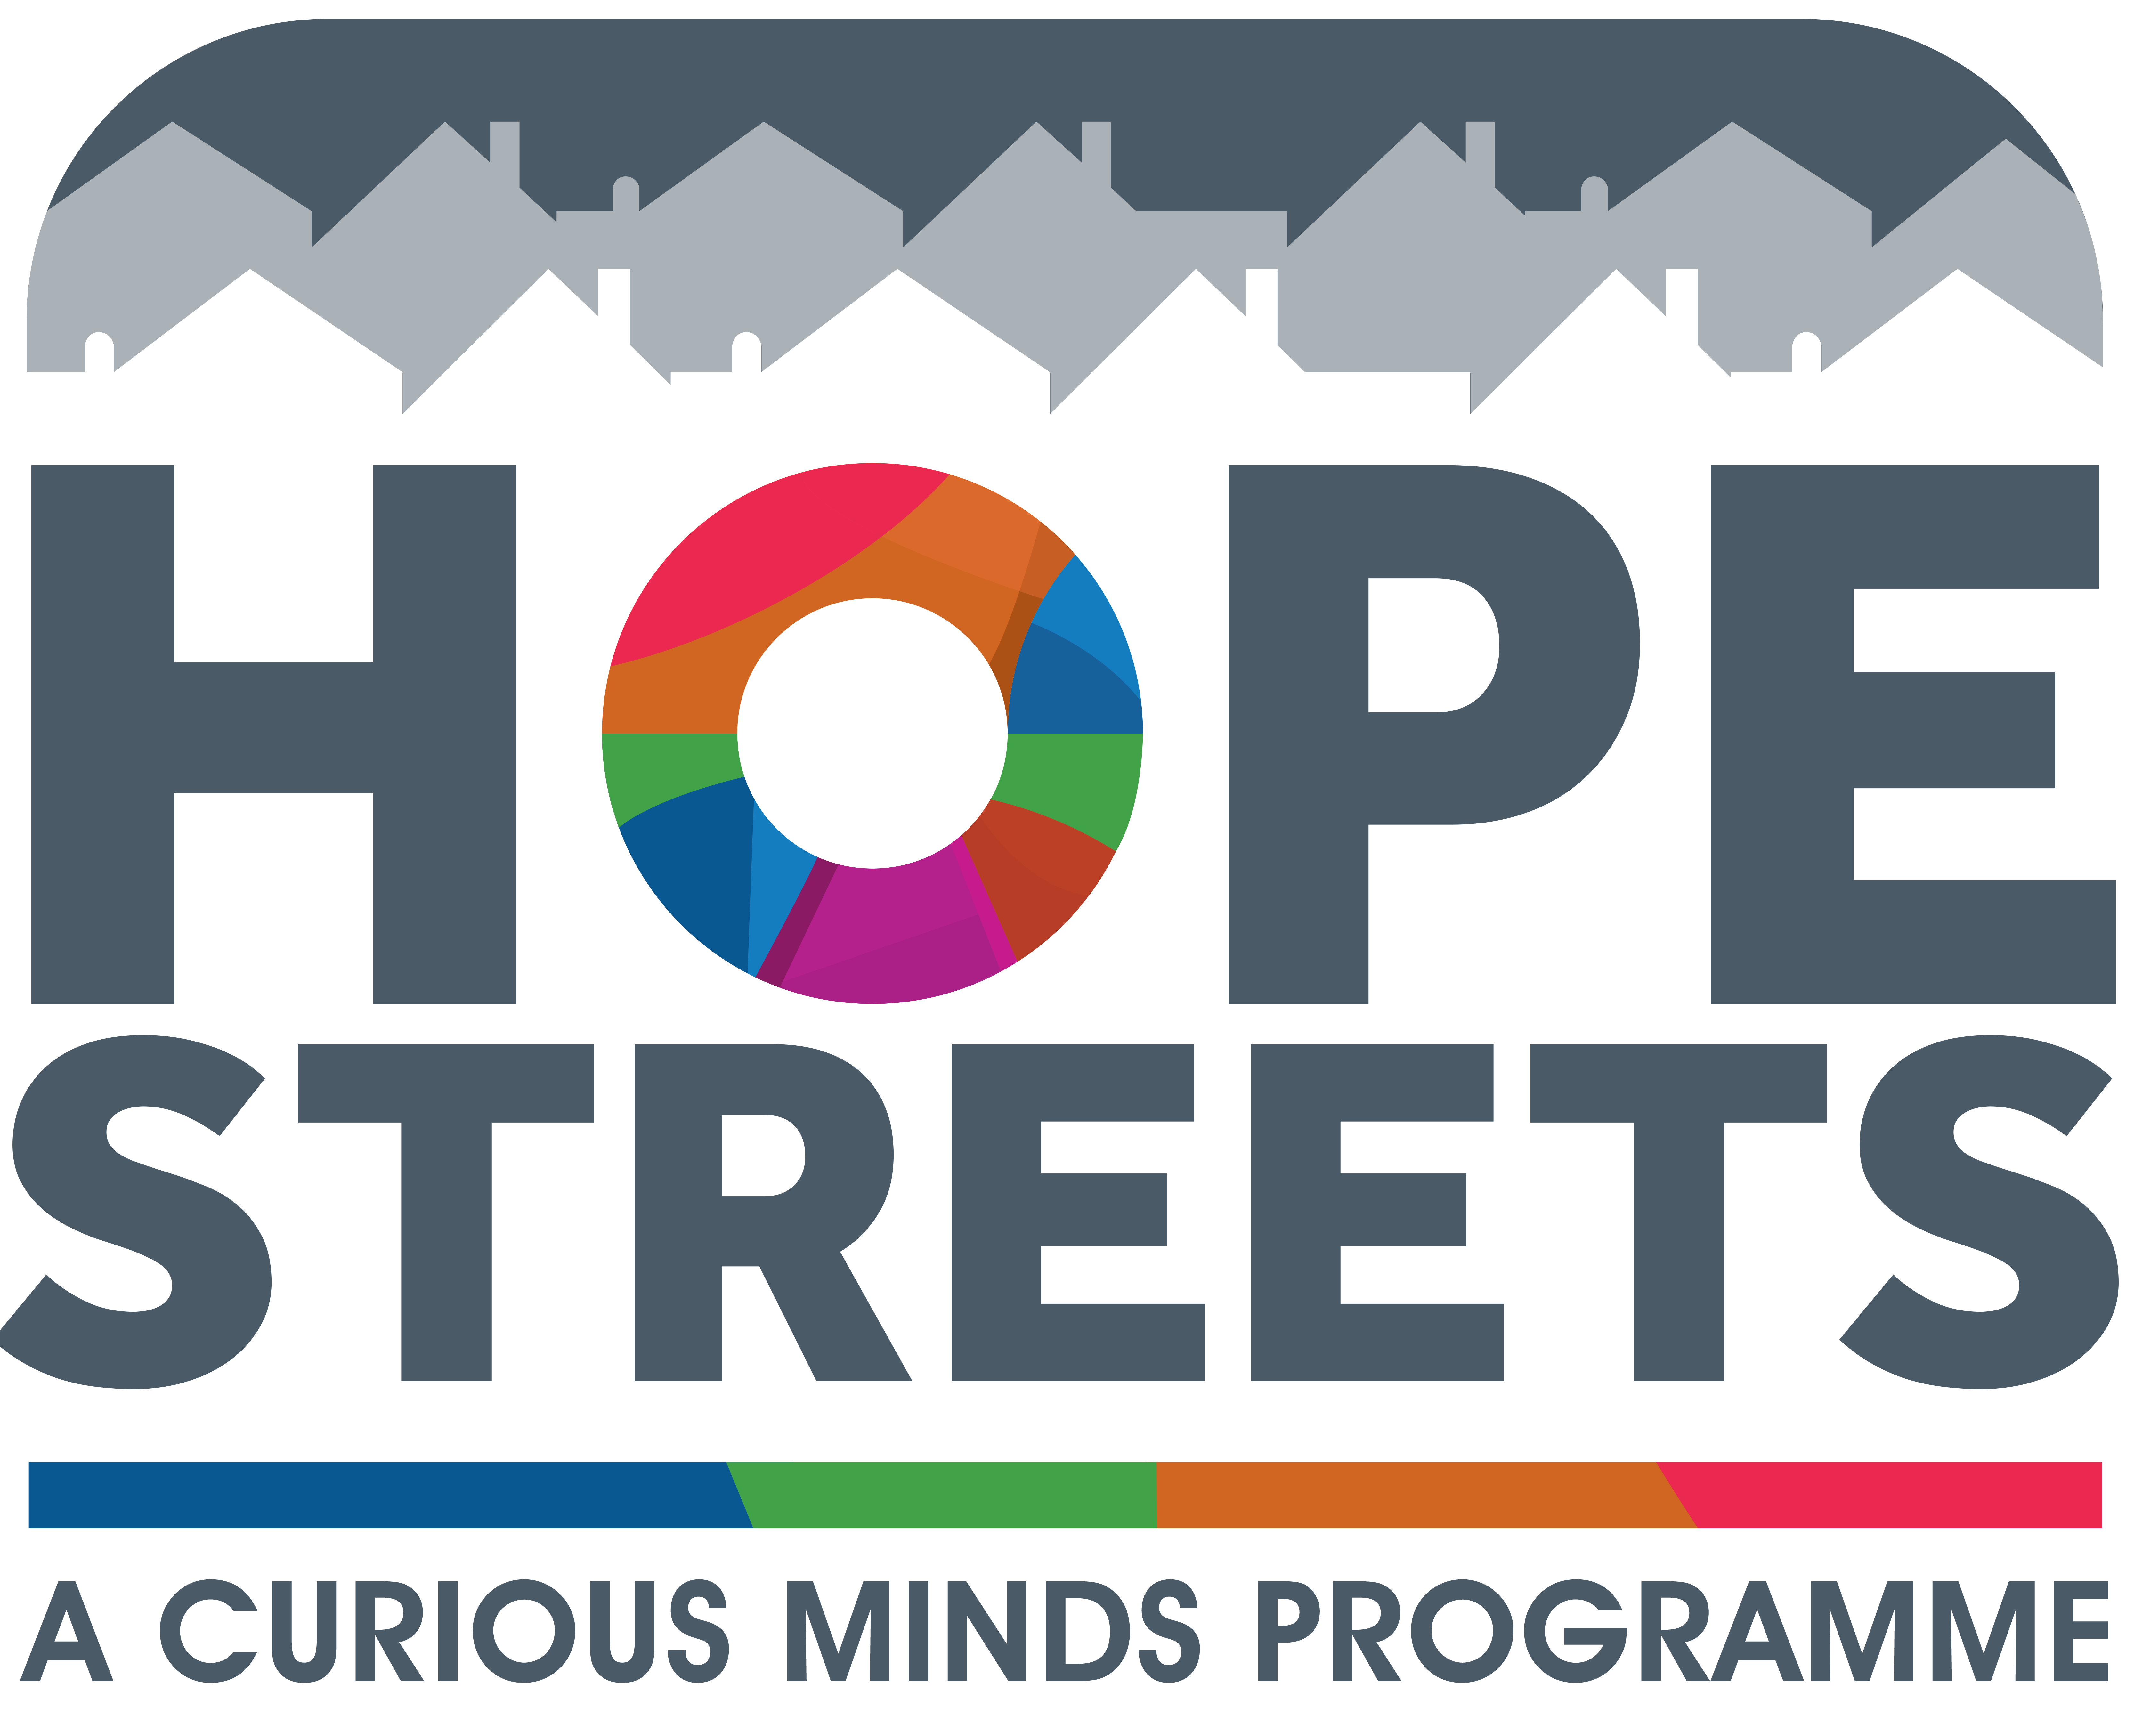 HopeStreetsLogo CM